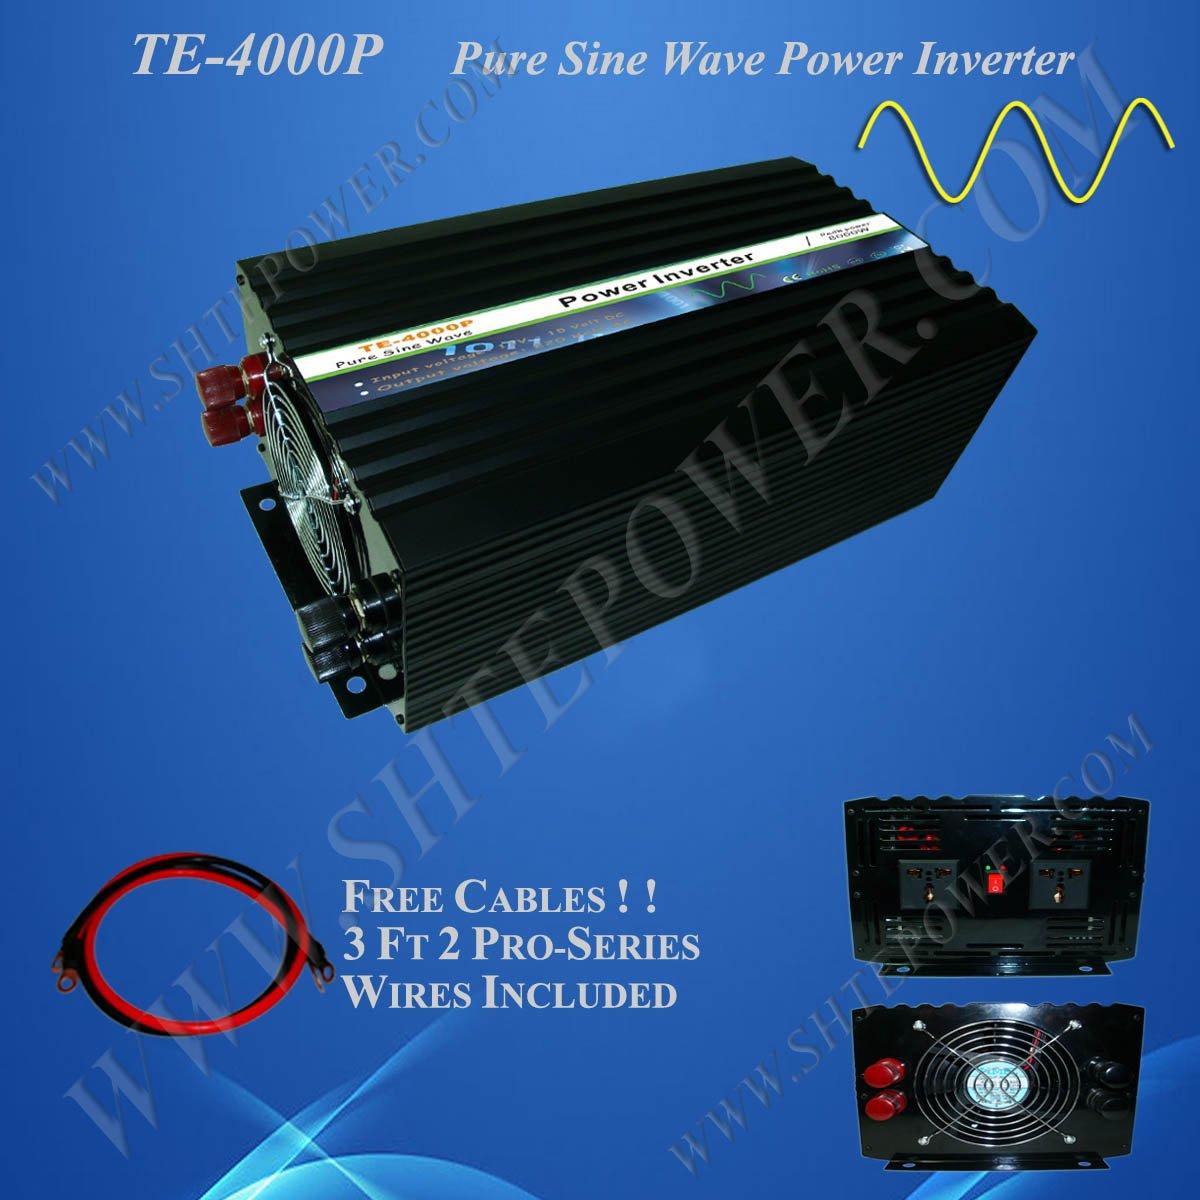 24v dc to 220v ac pure sine wave 4000w inverter 240v power inverter мультиметр uyigao ac dc ua18